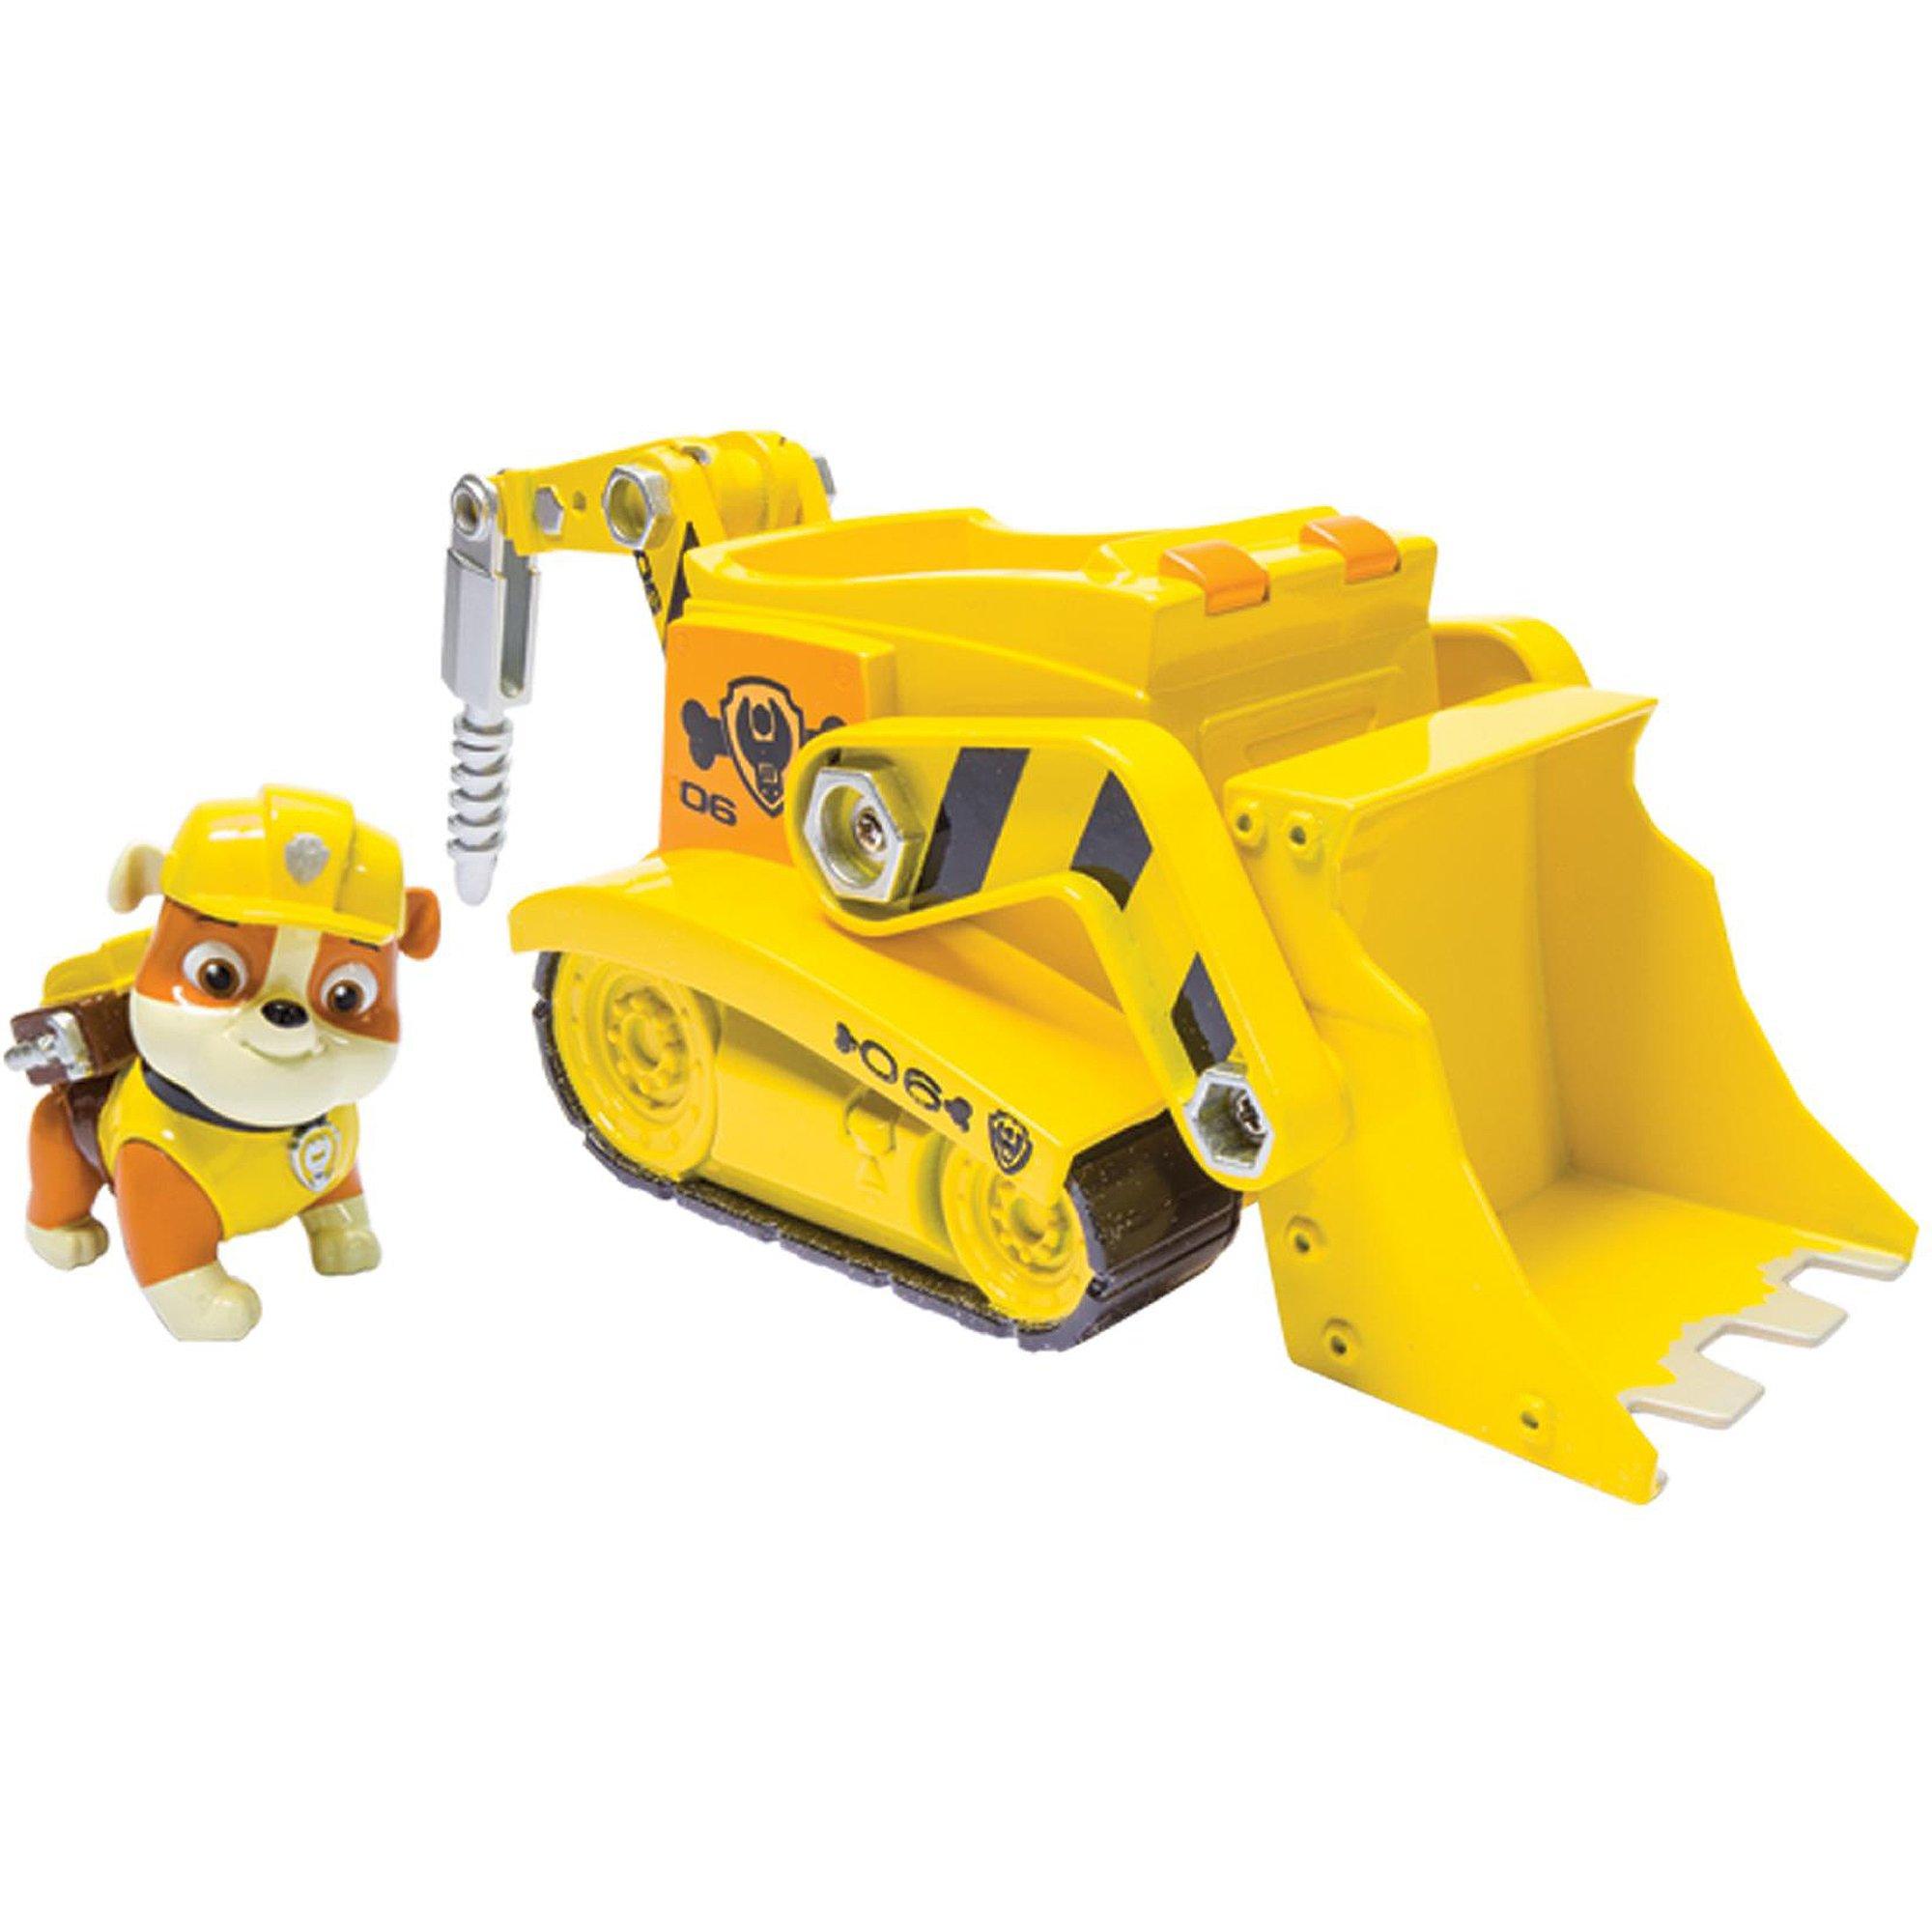 figurina paw patrol, rubble si buldozer